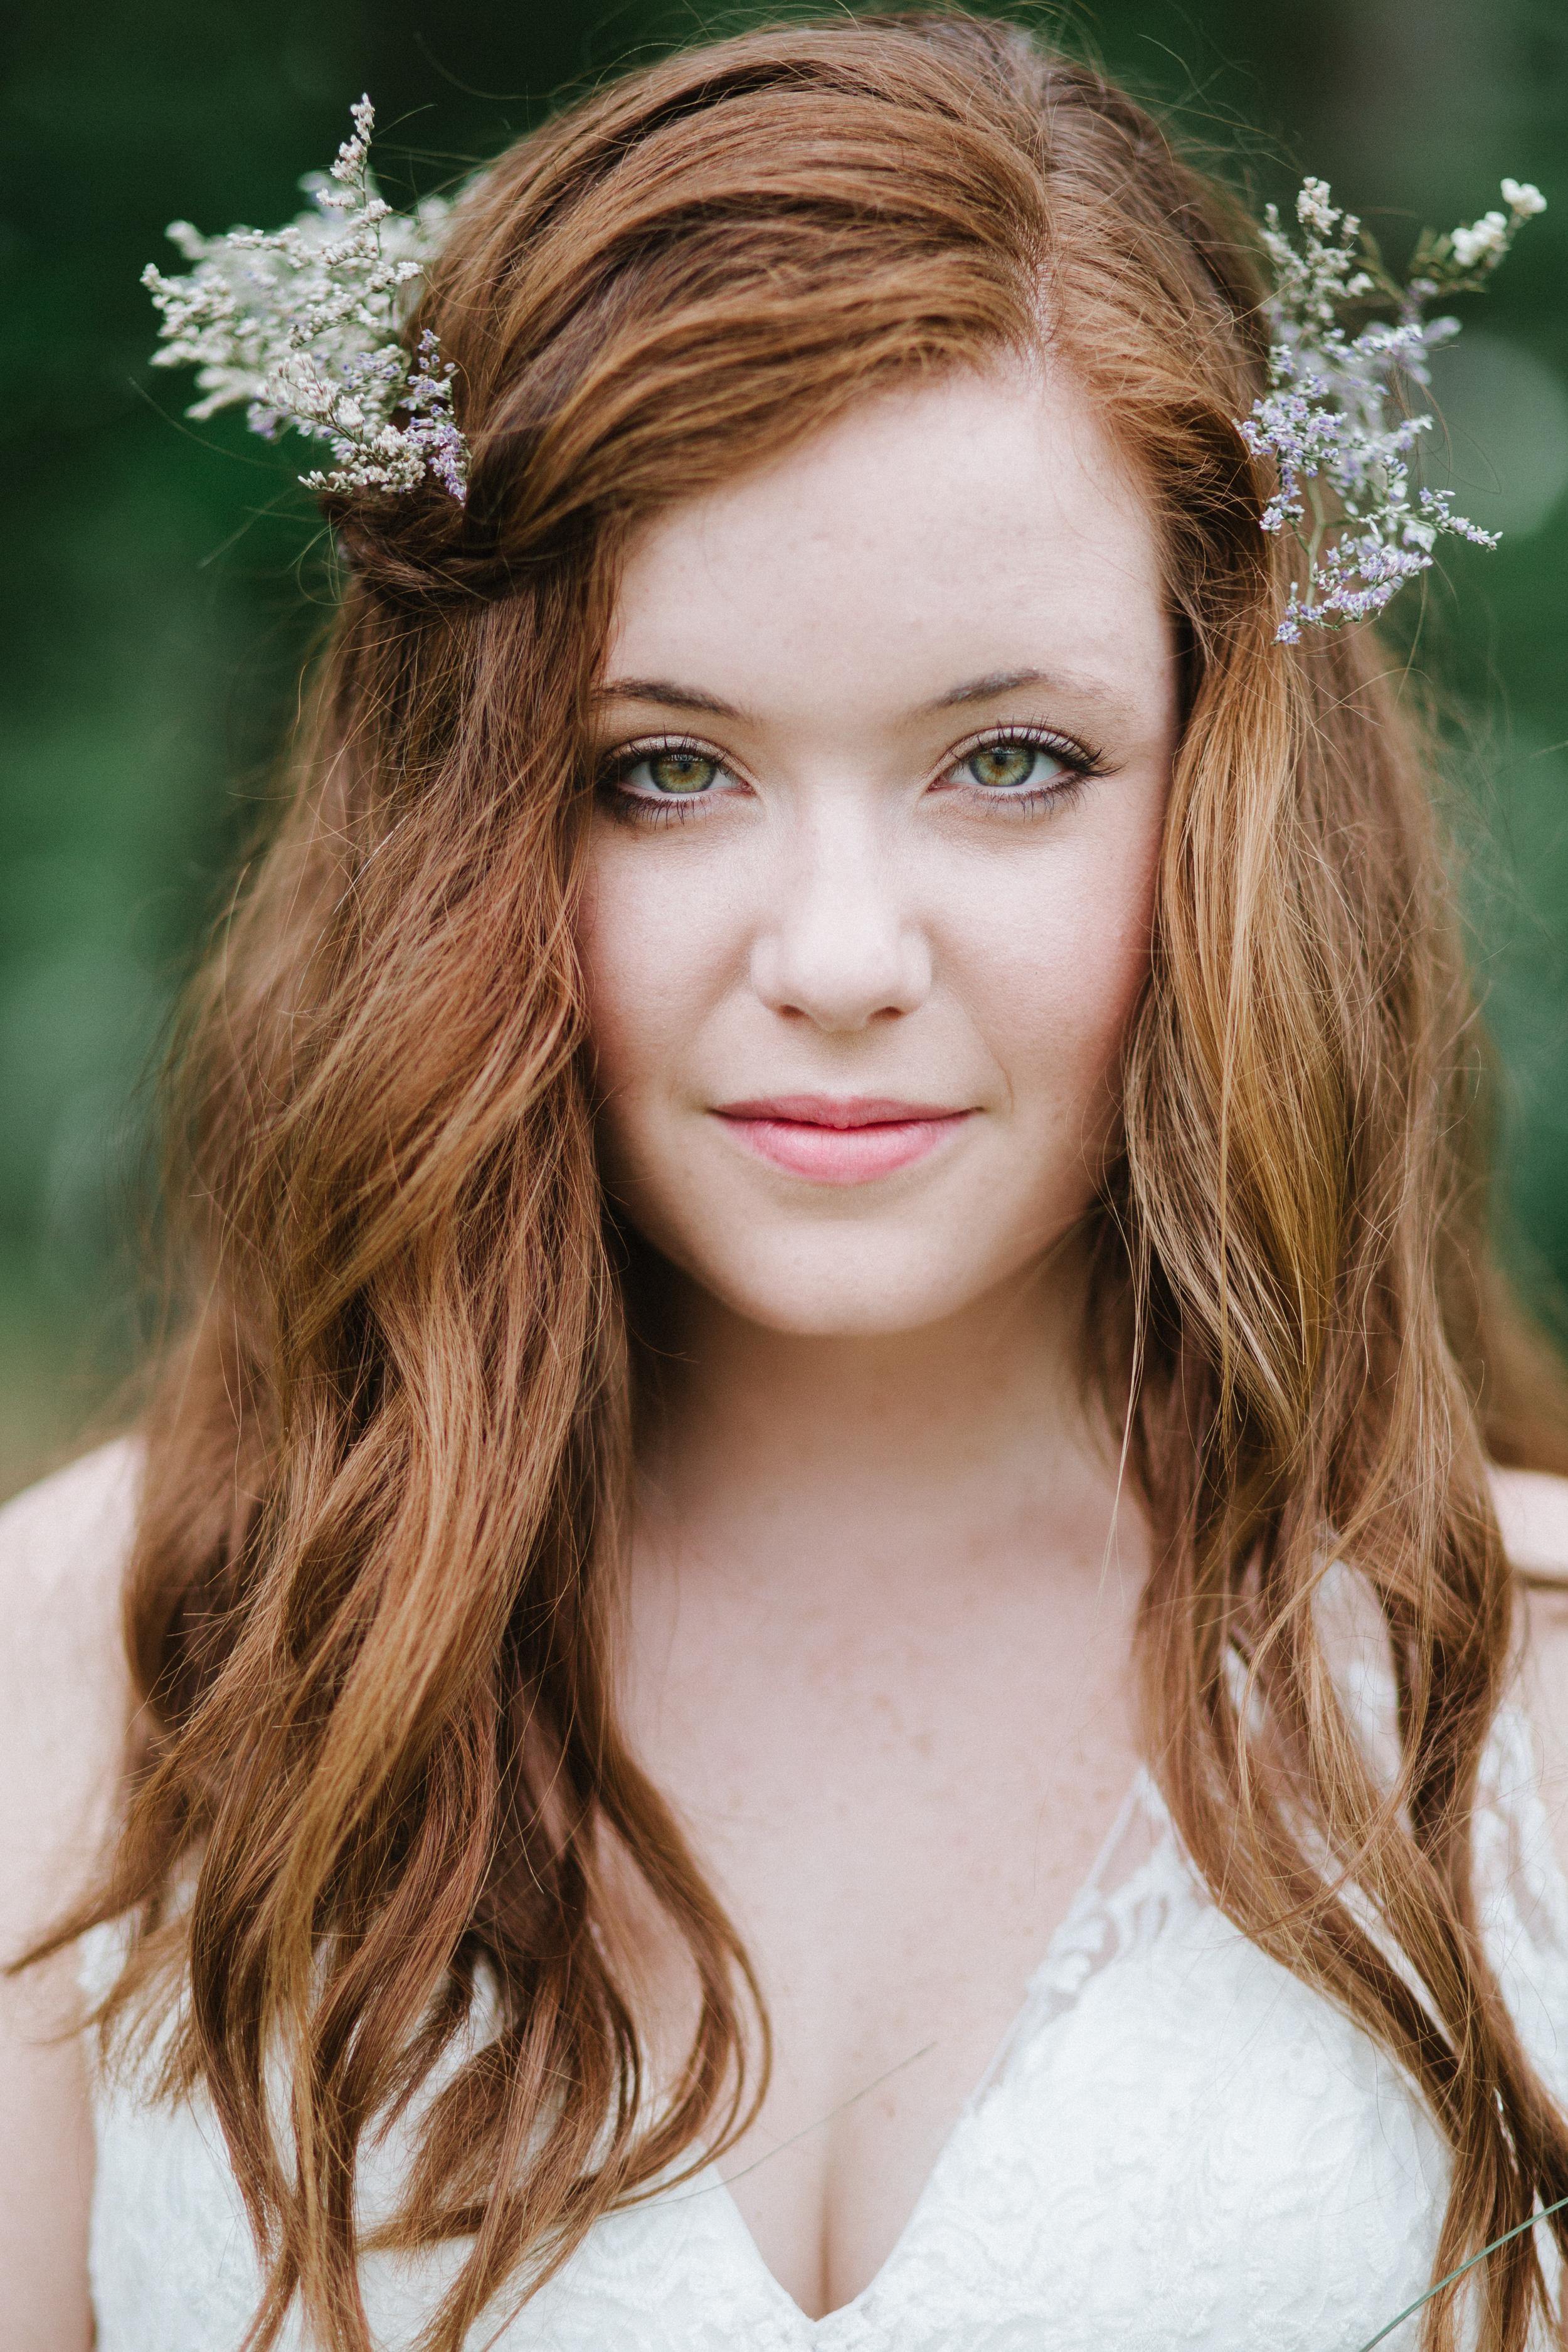 Dragonfly Photography by Miranda, LLC - Alabama Wedding Photographer